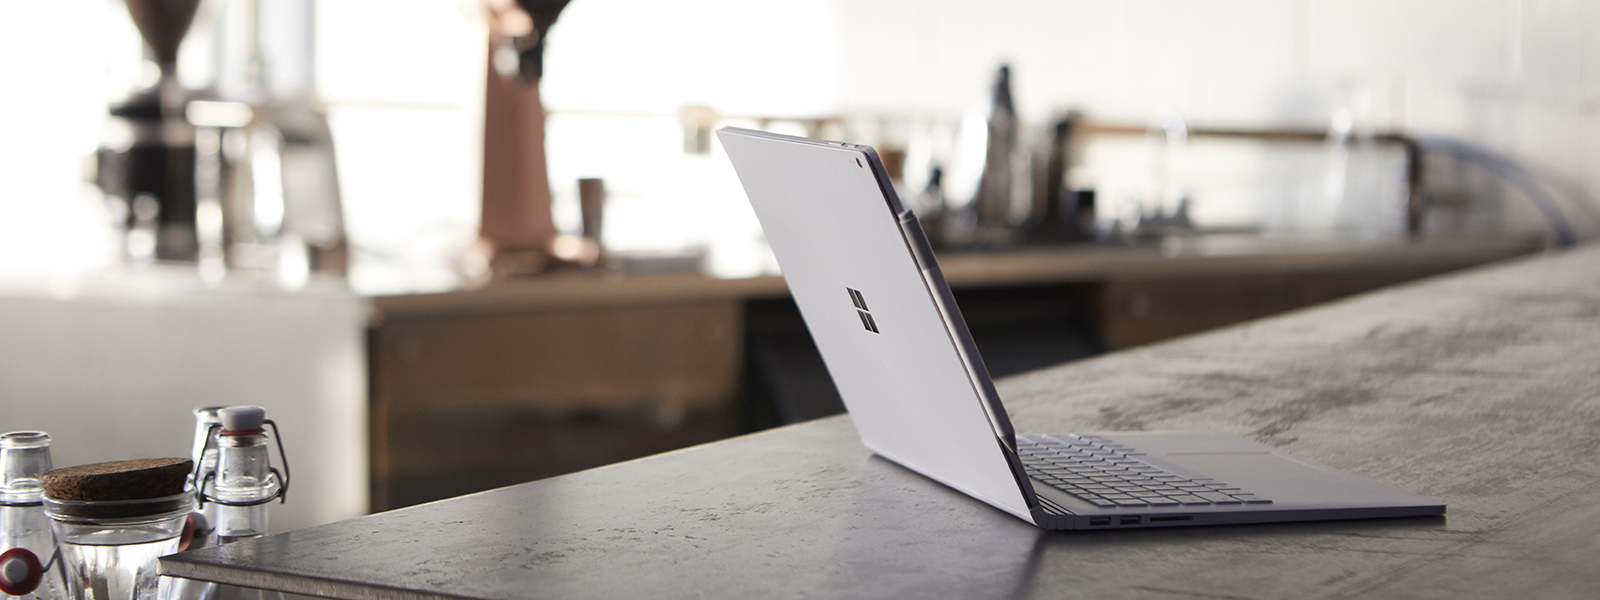 Surface Book 2 med Surface Pen på et bord